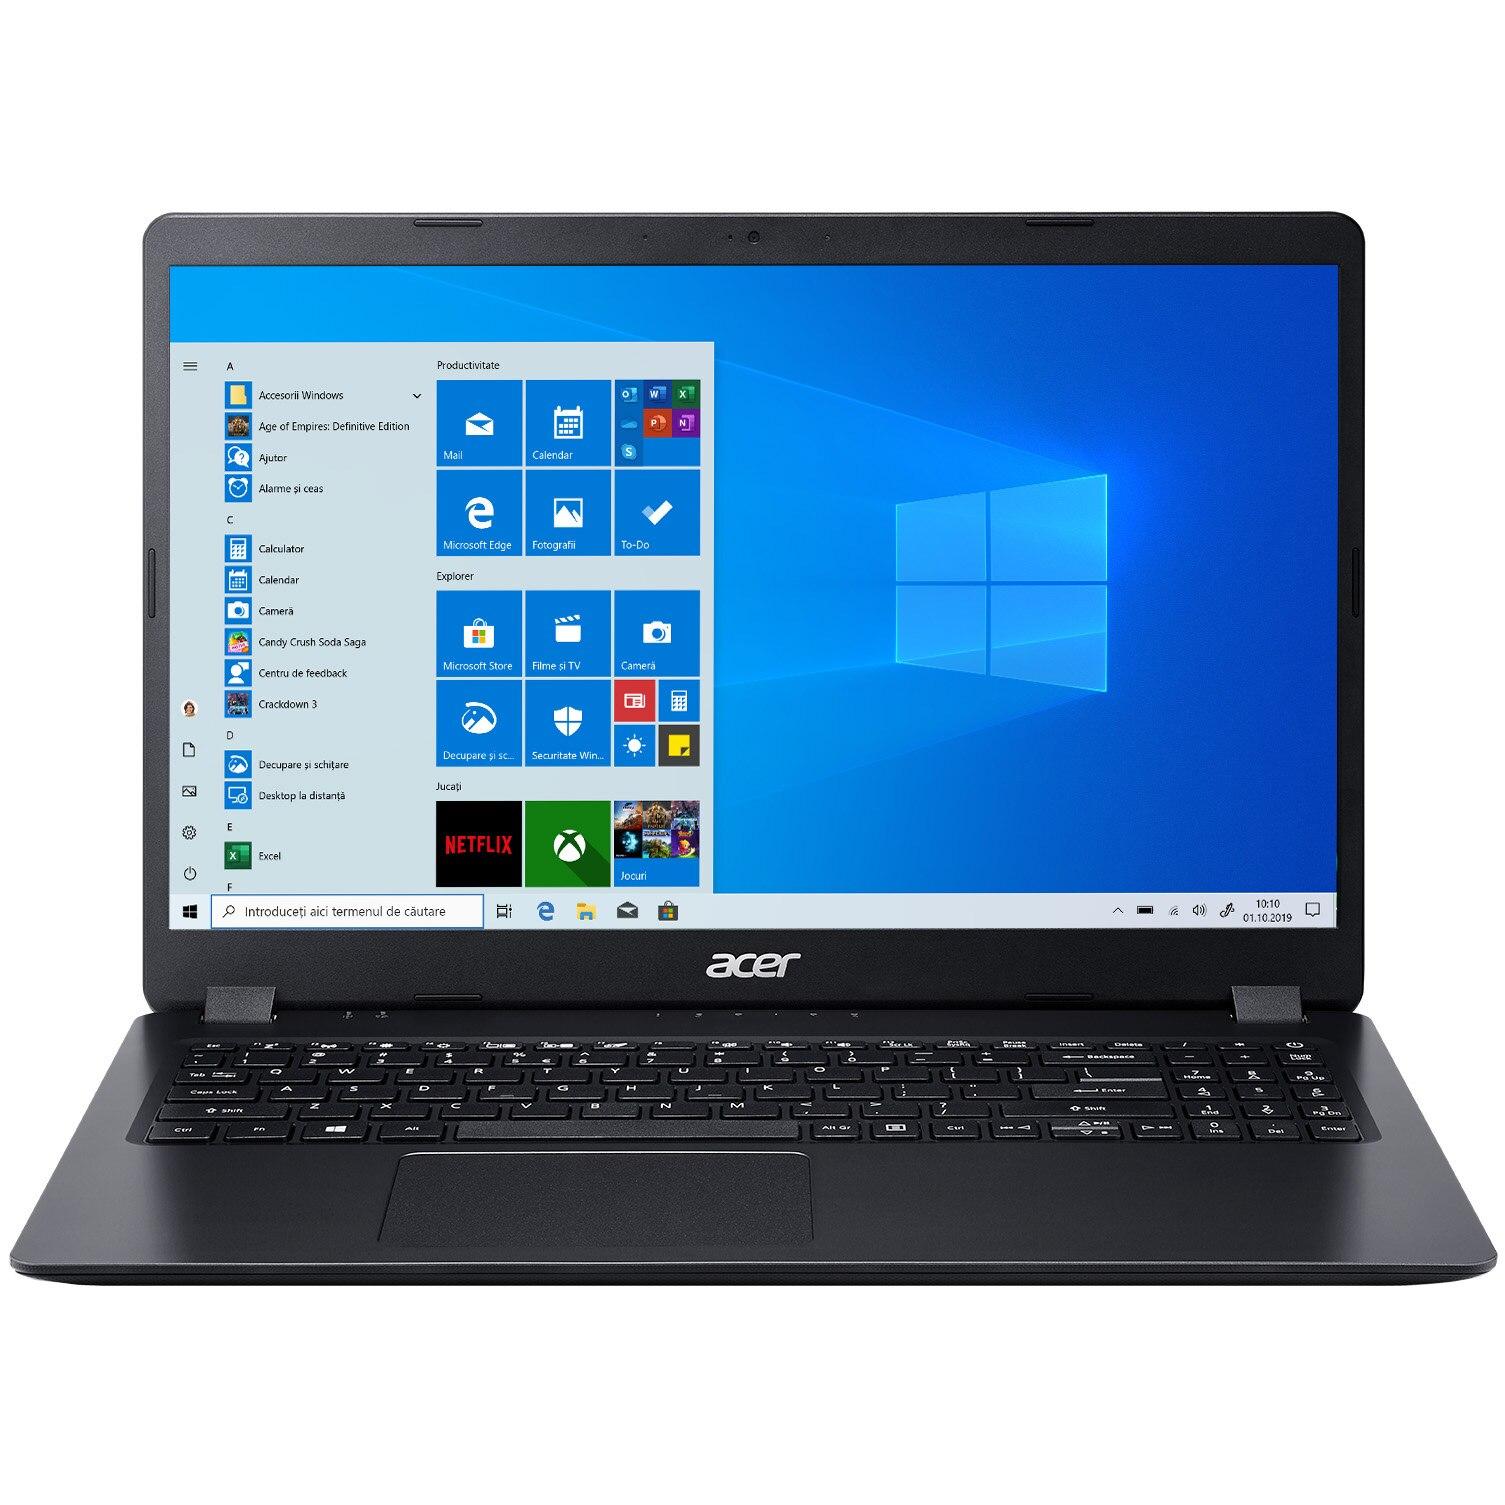 "Fotografie Laptop Acer Aspire 3 A315-42G cu procesor AMD Ryzen 5 3500U pana la3.70 GHz, 15.6"", Full HD, 8GB, 256GB SSD, AMD Radeon 540X 2GB, Windows 10 Home, Black"